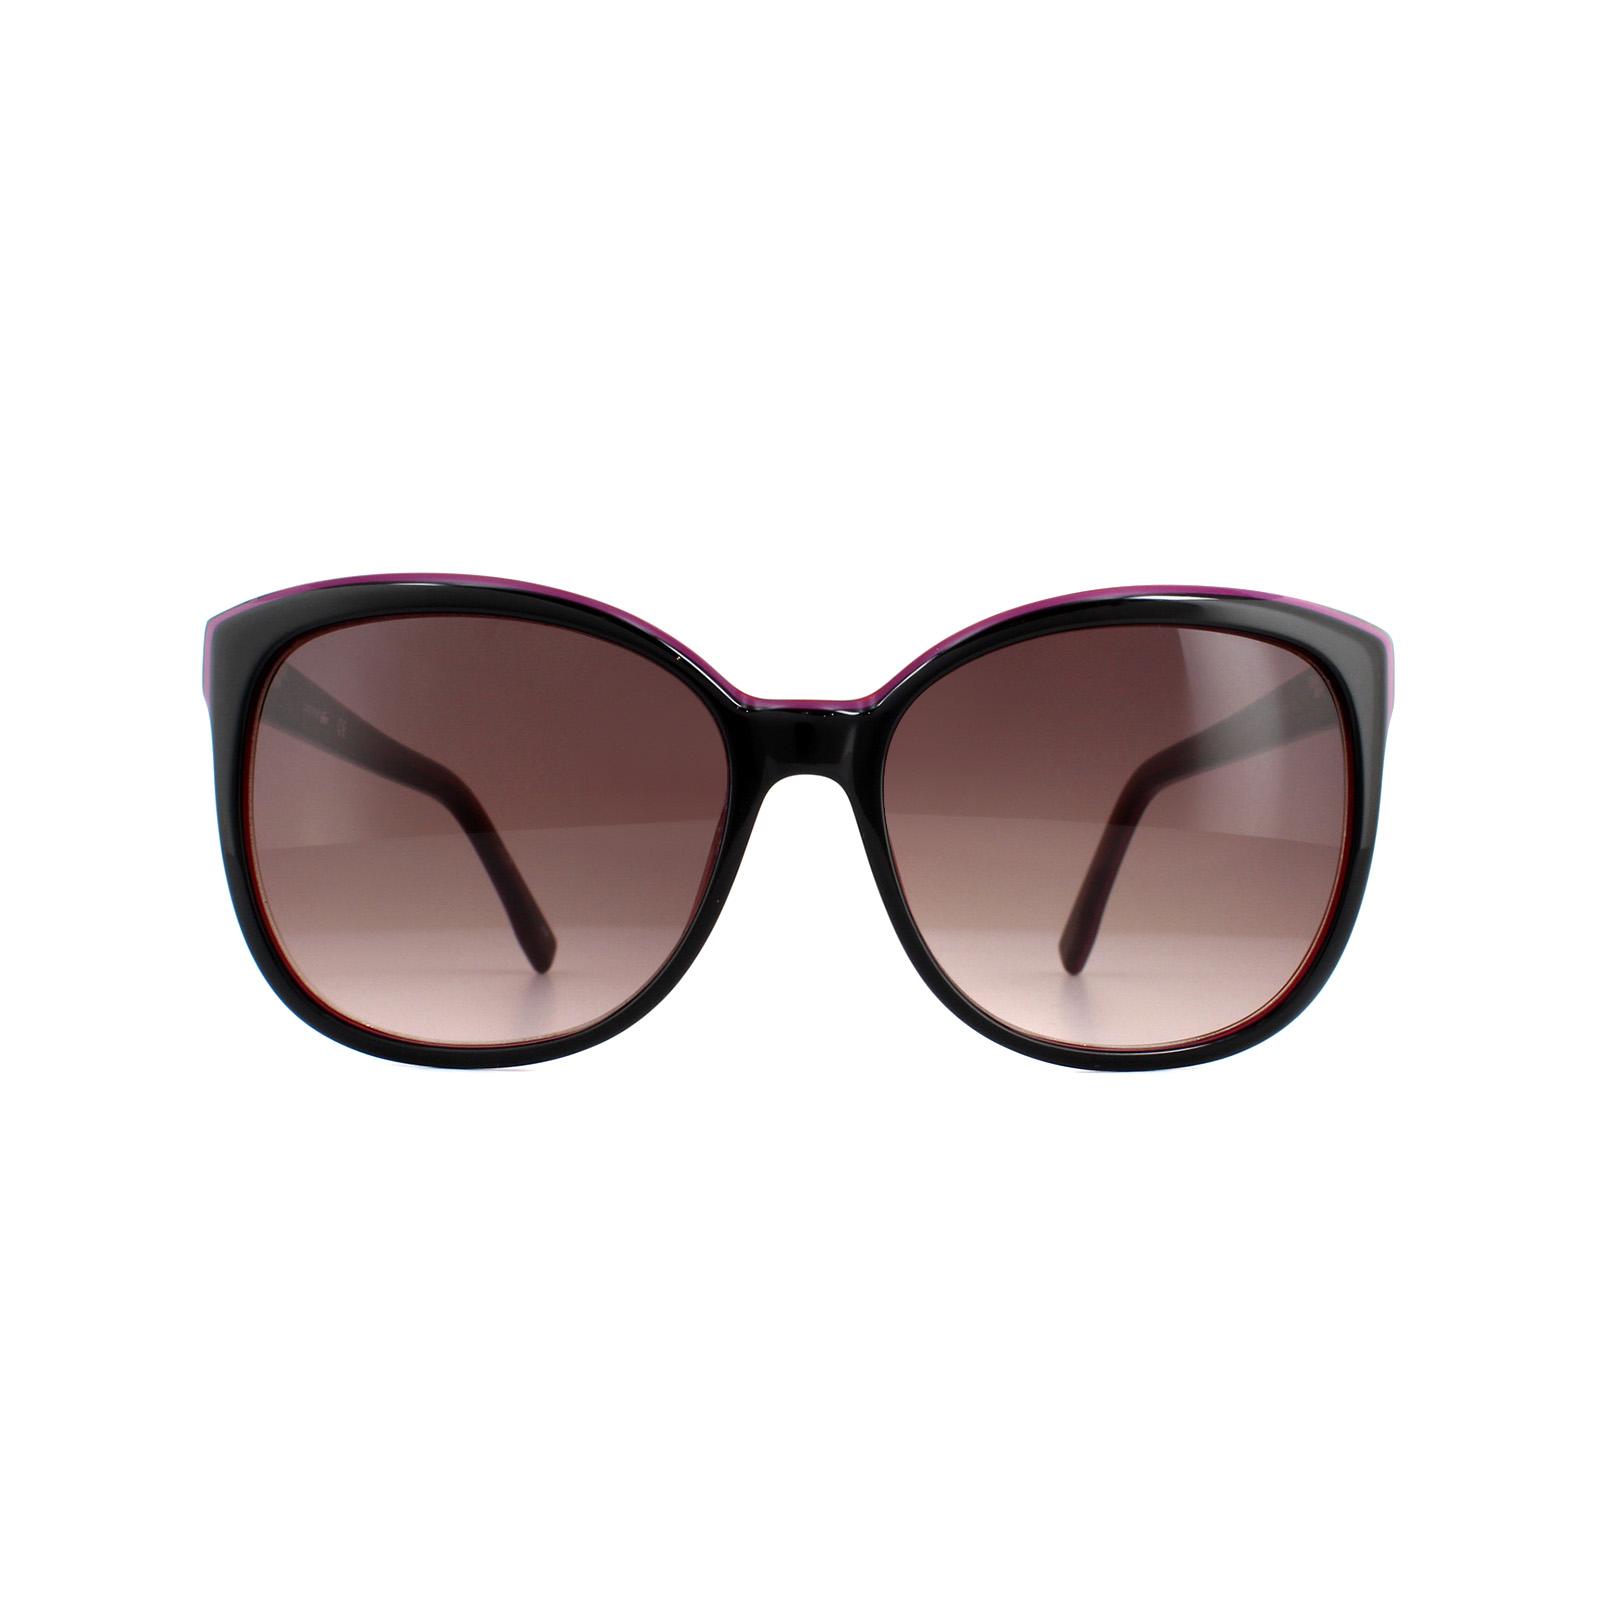 4fdb5d16ae5 Lacoste Sunglasses L747S 001 Black Red Brown Gradient 886895200868 ...